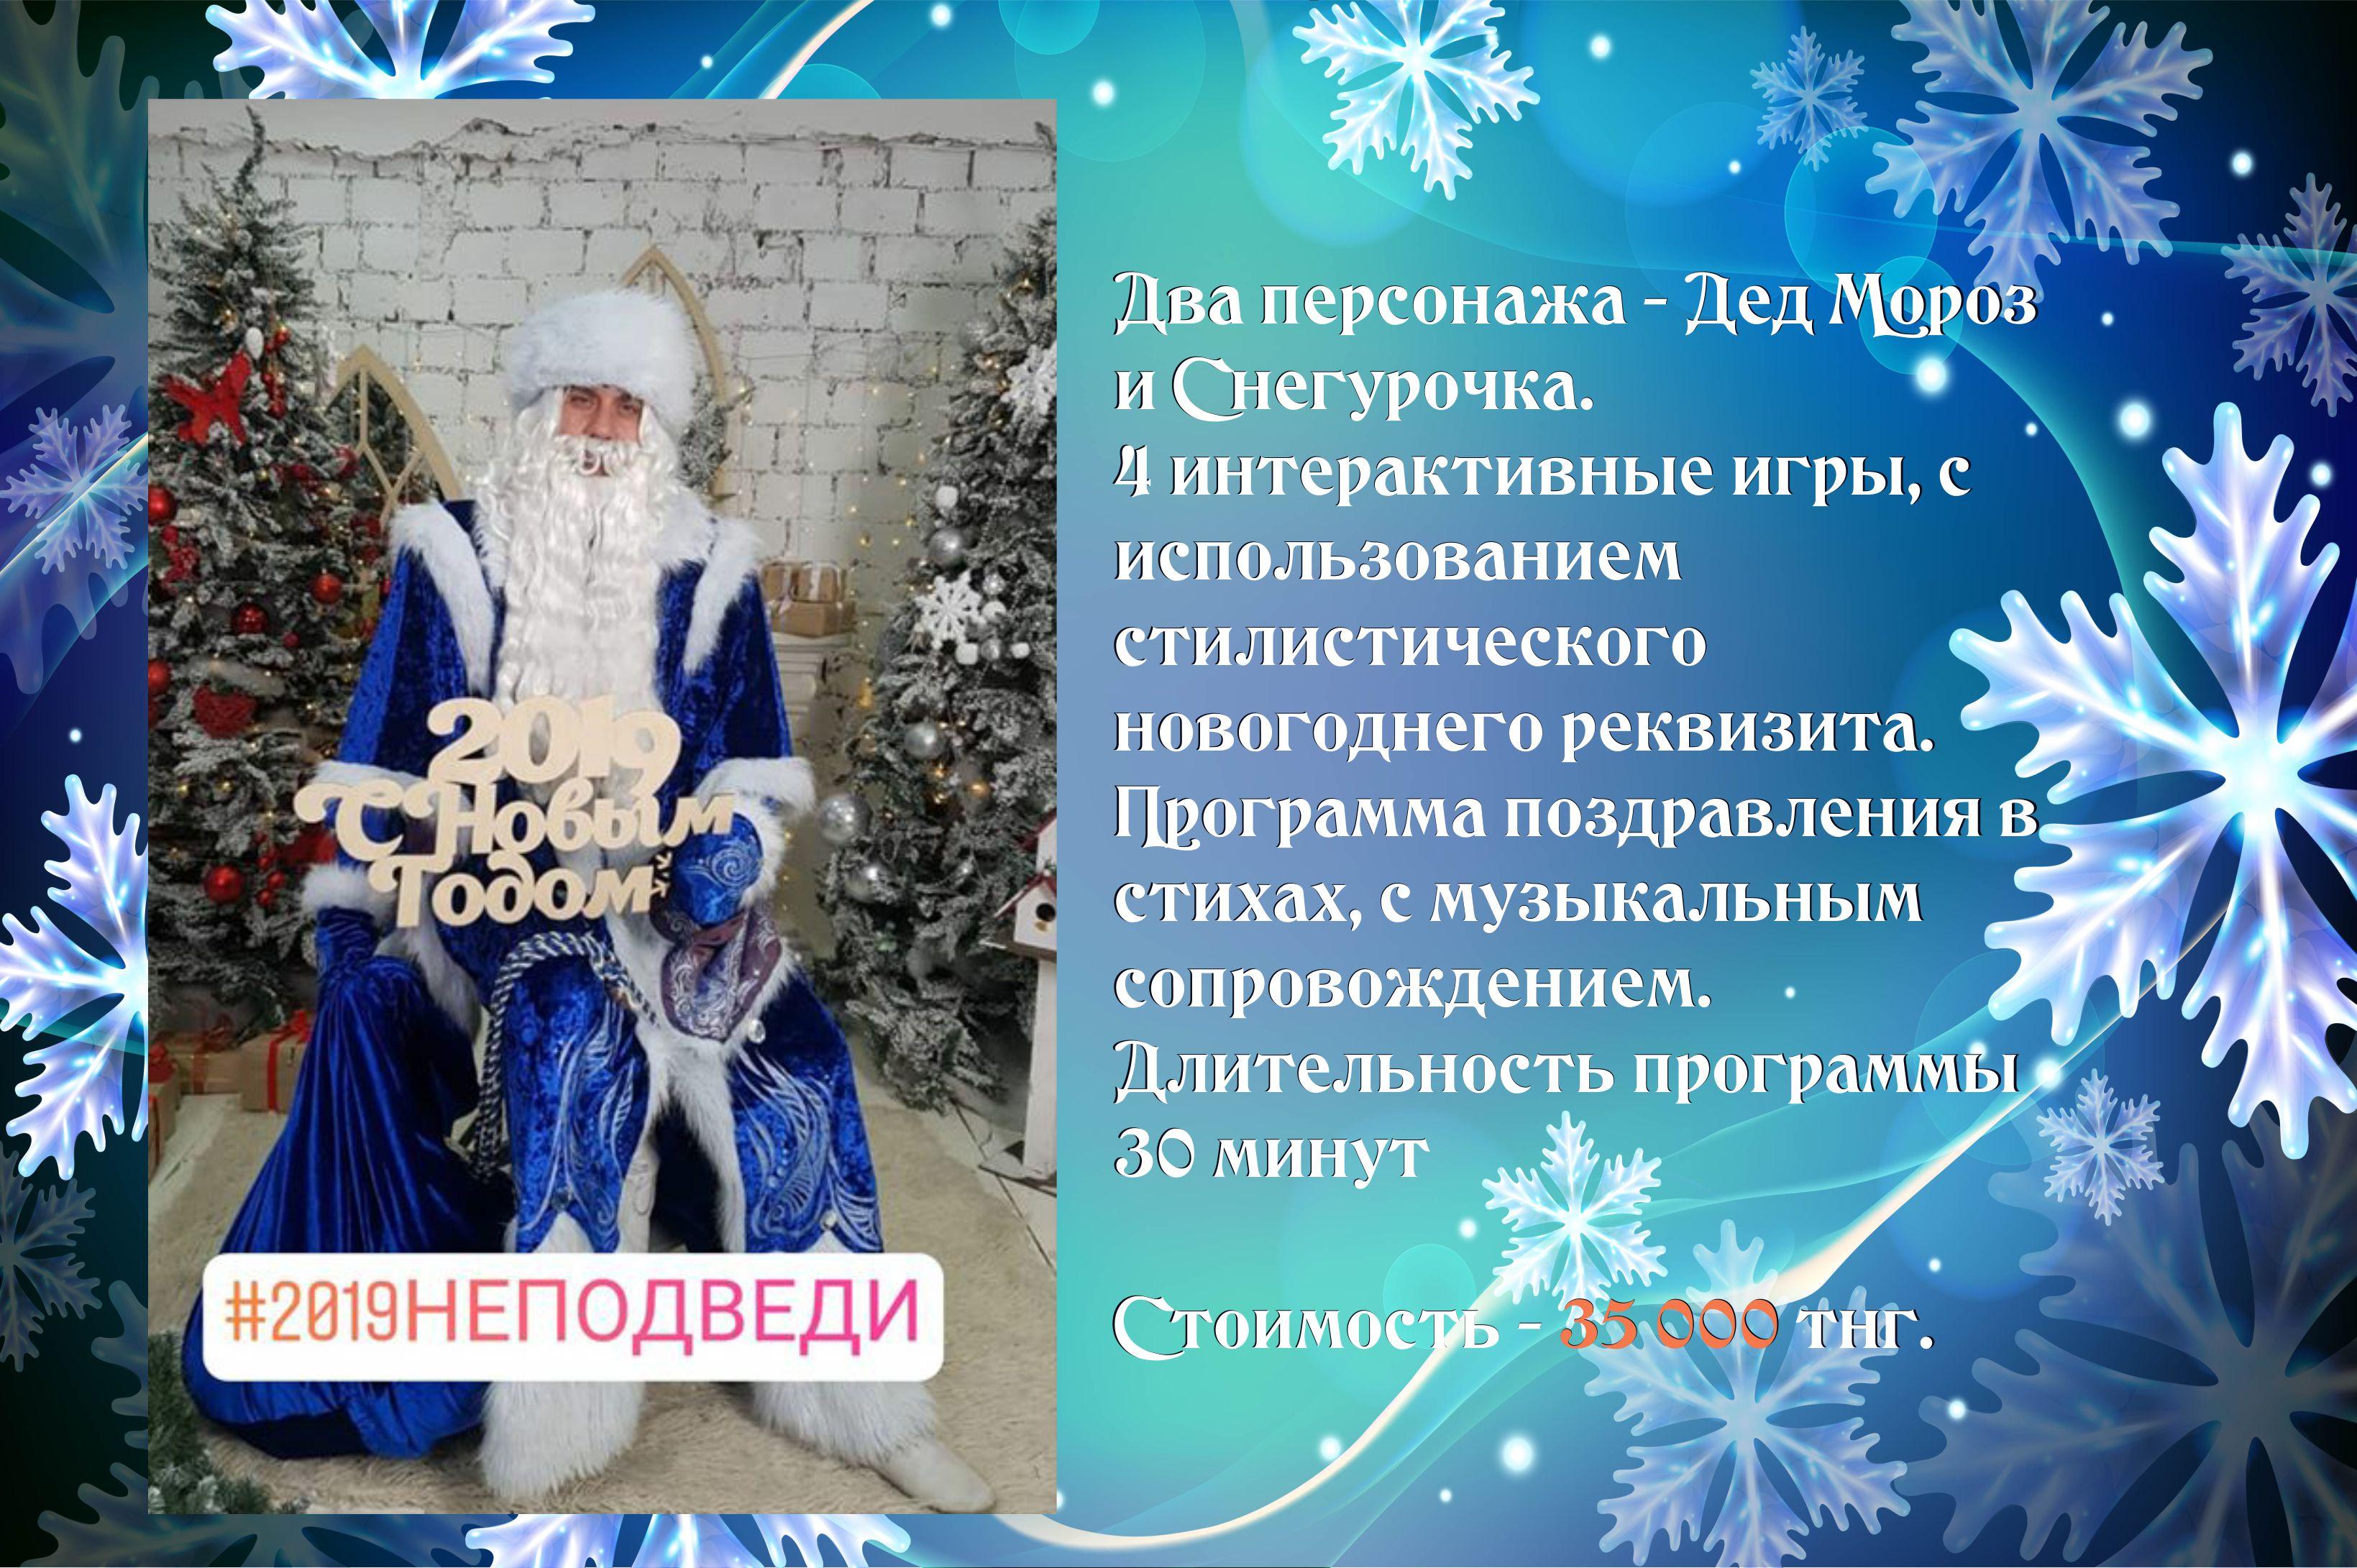 Дед_Мороз_и_Снегурочка_Алматы.jpg